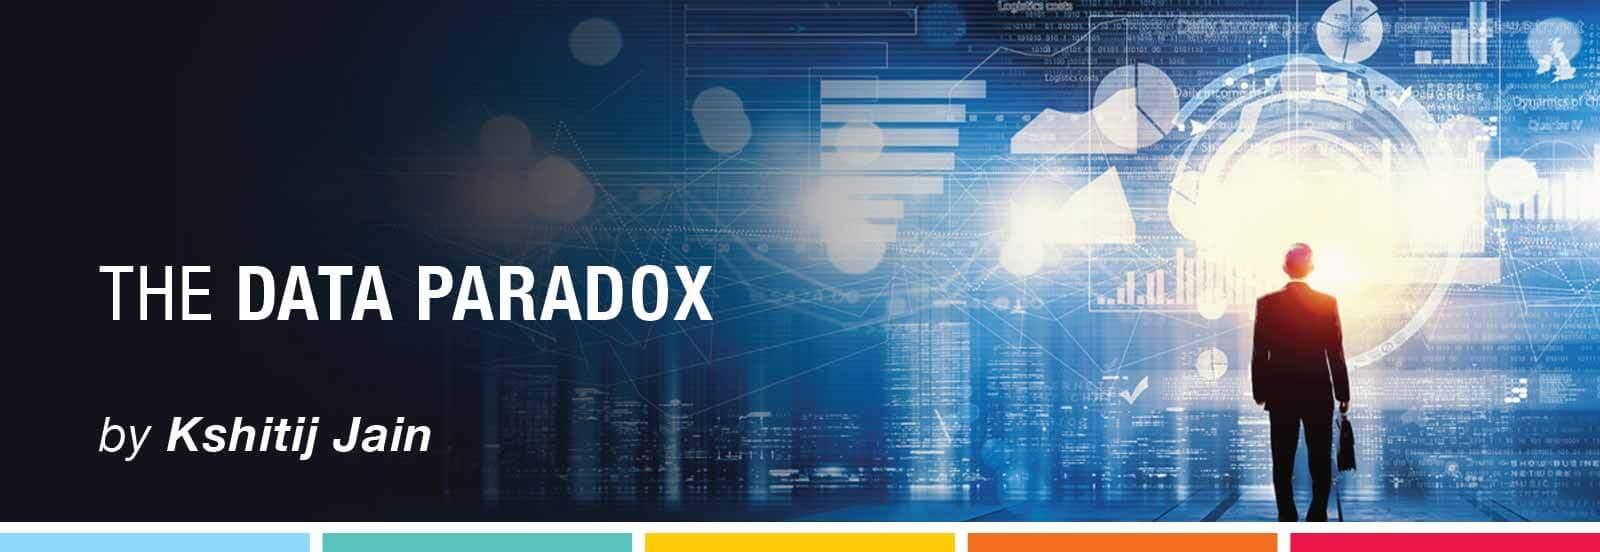 data paradox